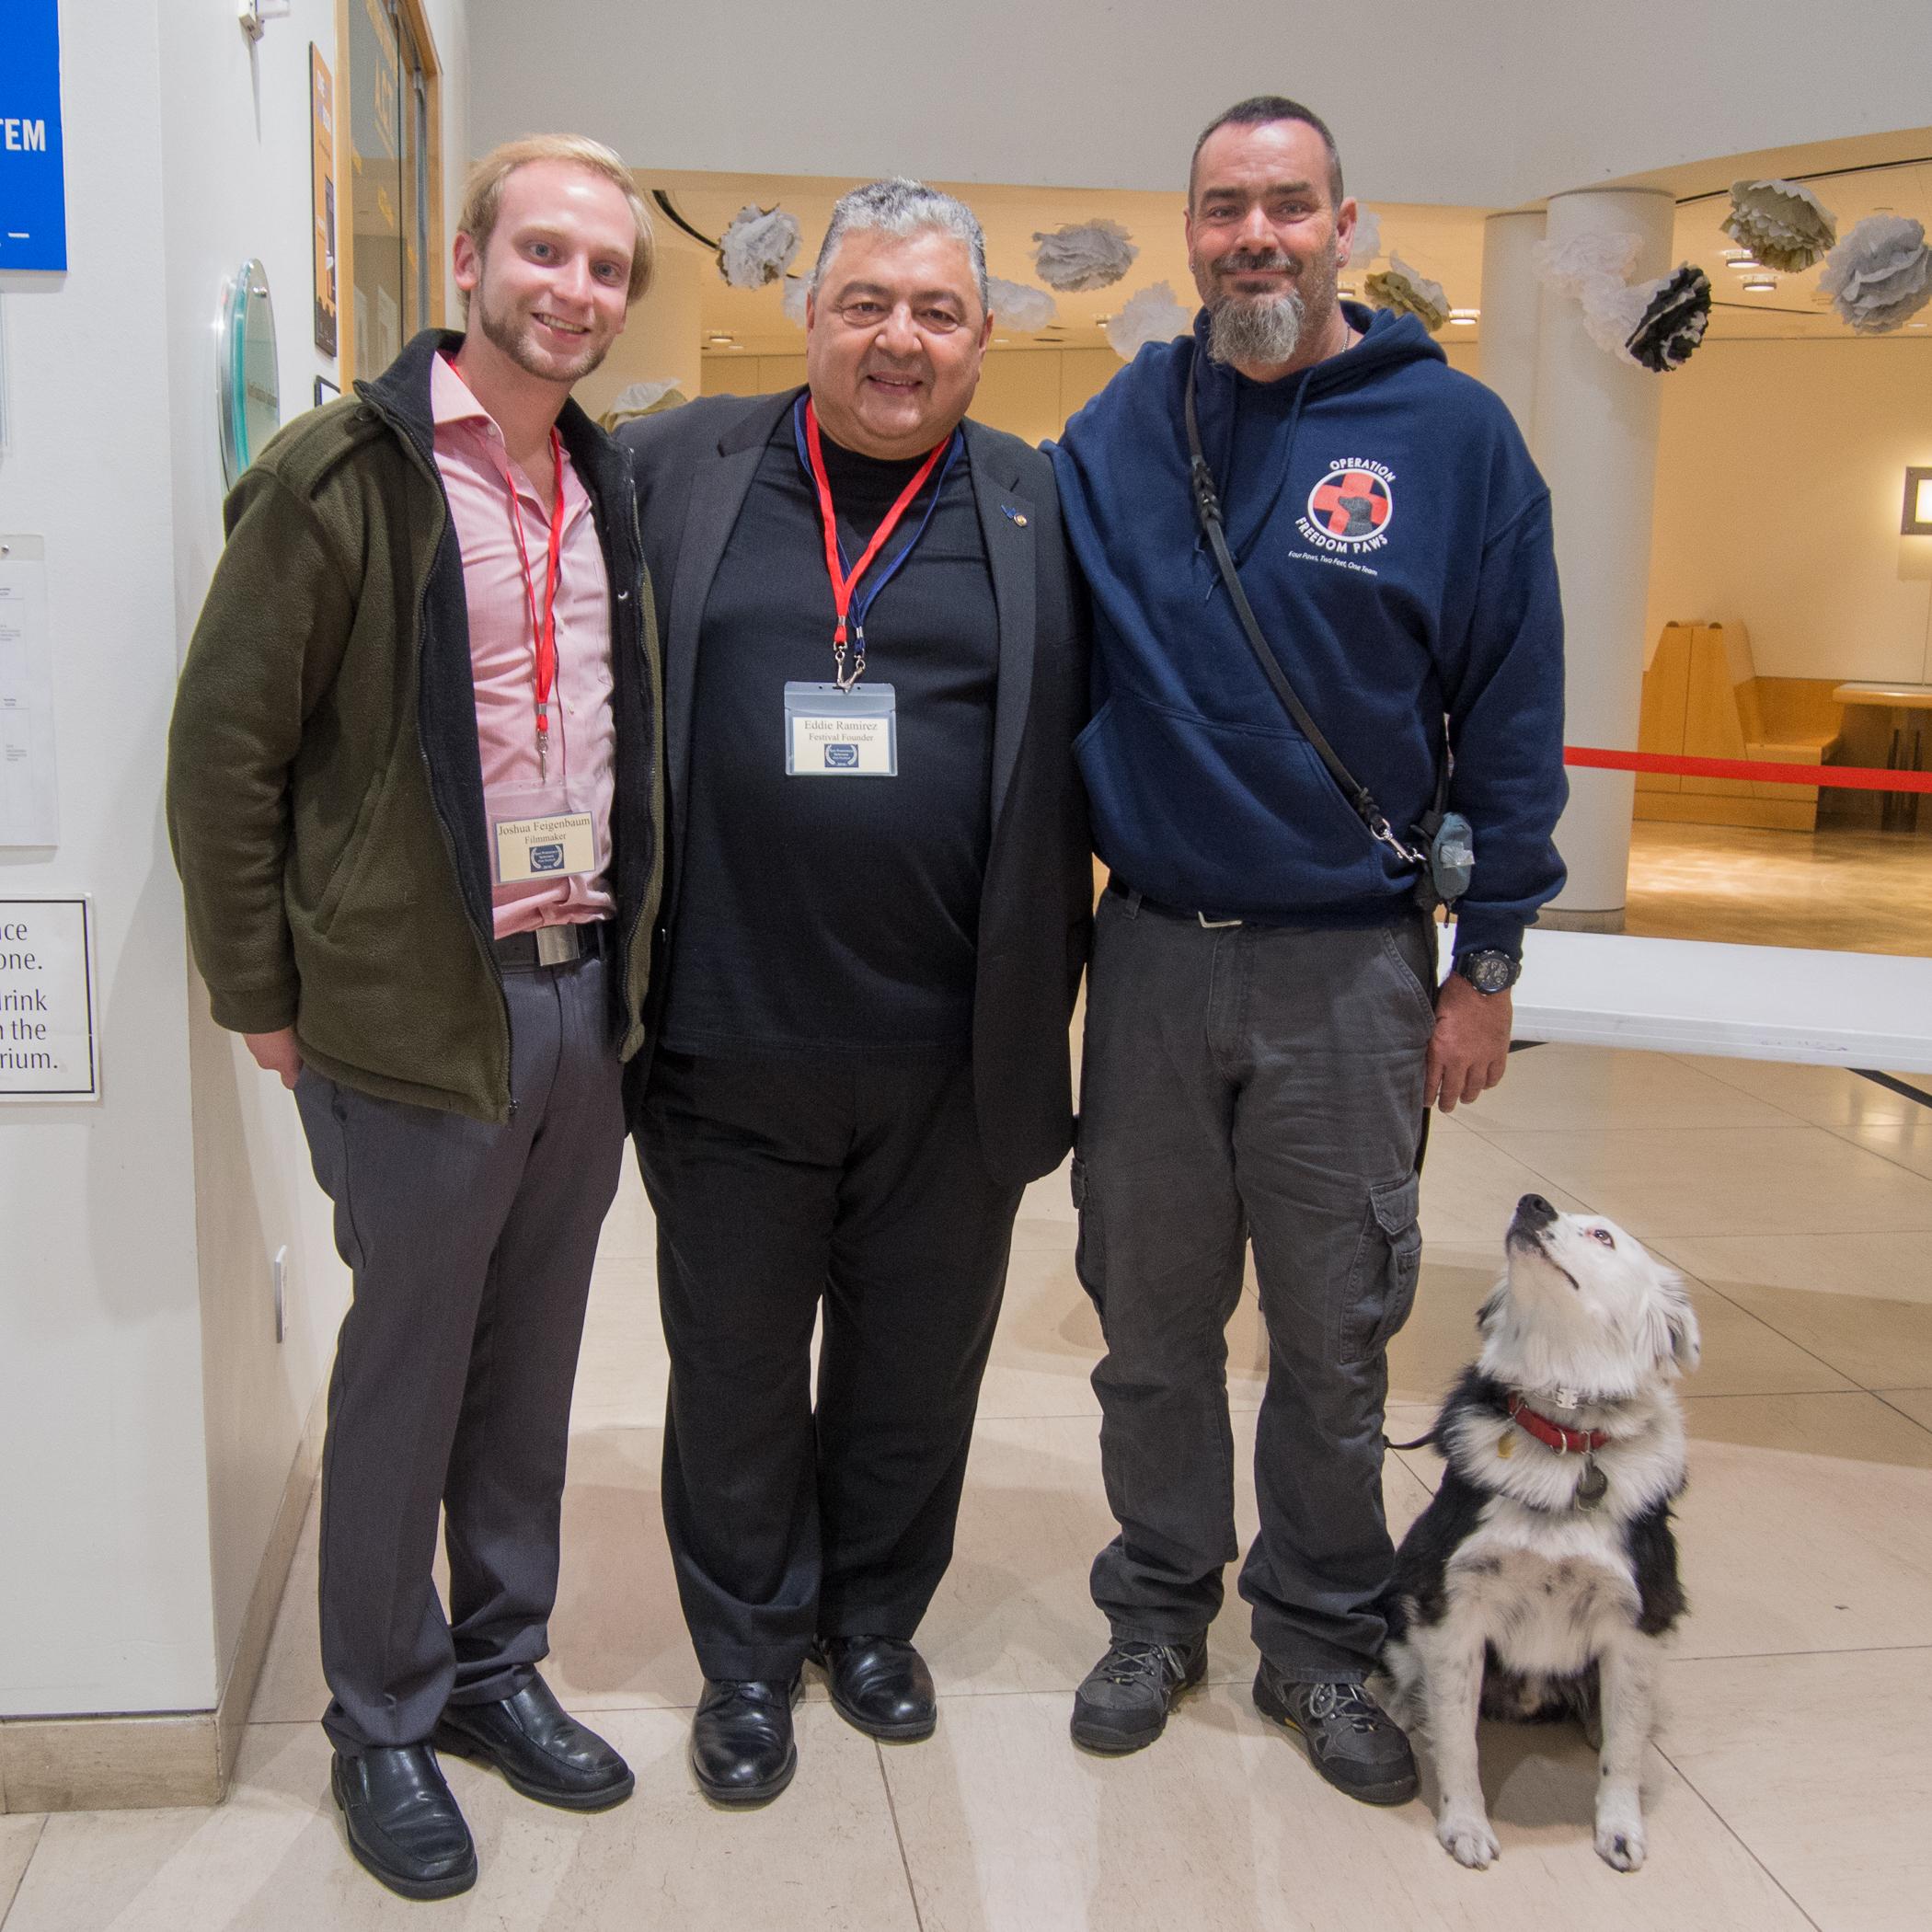 Filmmaker Joshua Feigenbaum, Founder Eduardo Eddie Ramirez, veteran Dave Jennelle